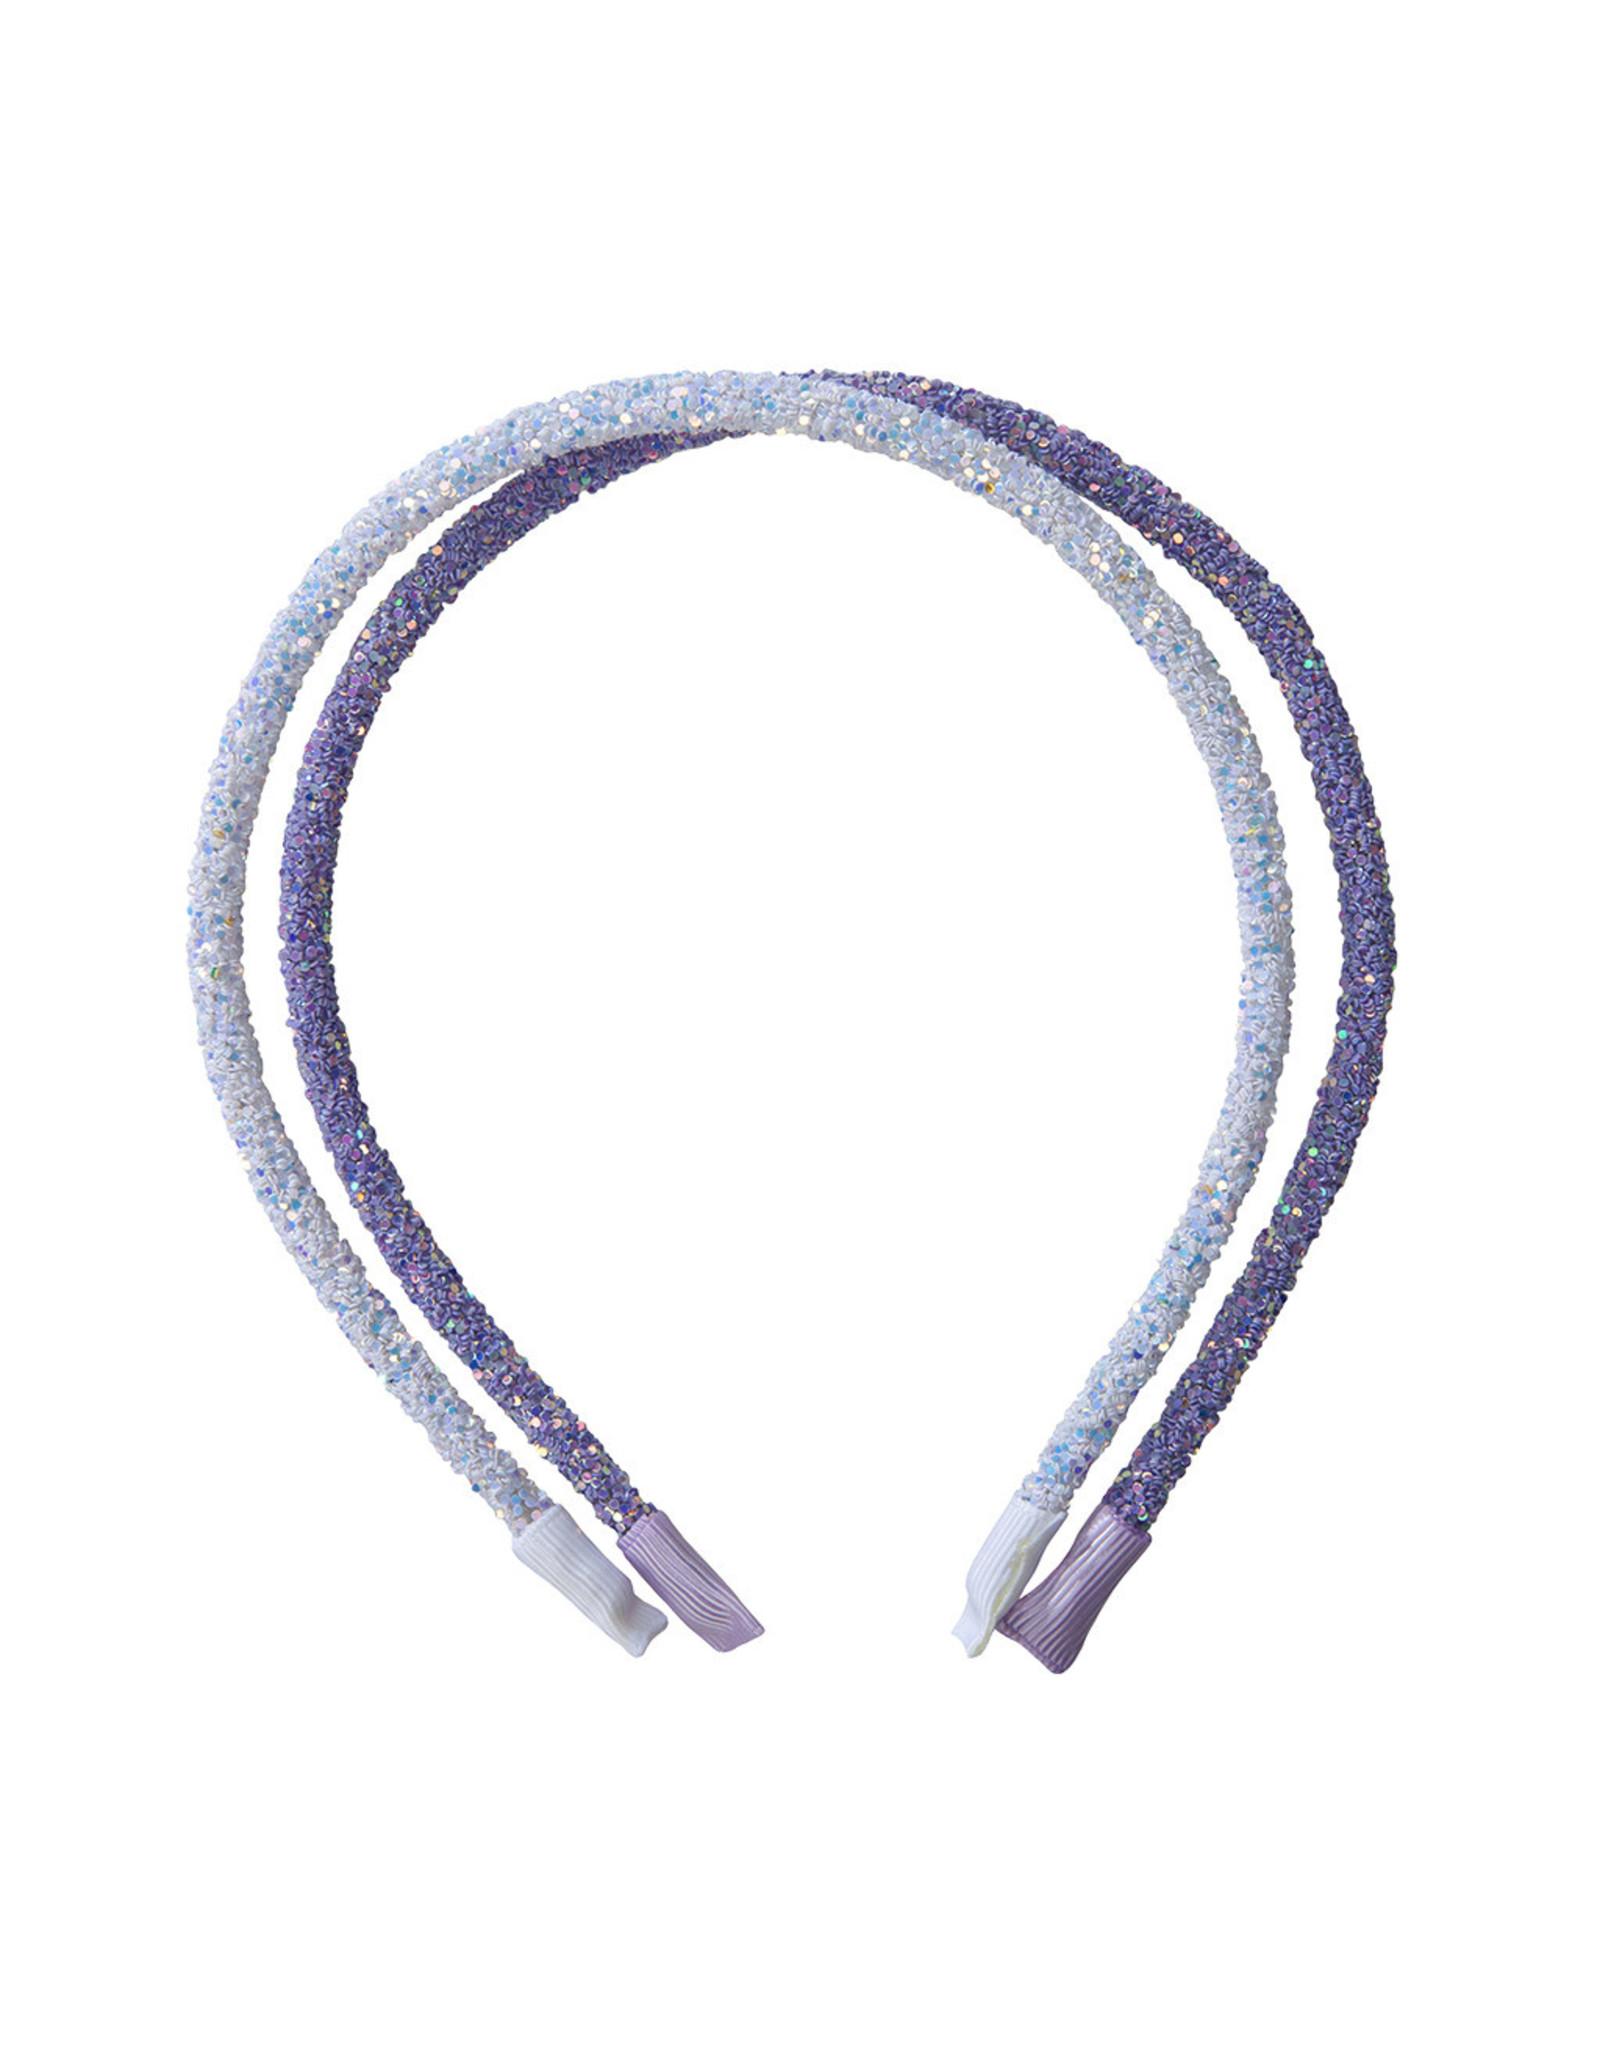 CREATIVE EDUCATION Blissful Crystal Headbands (2 pcs)